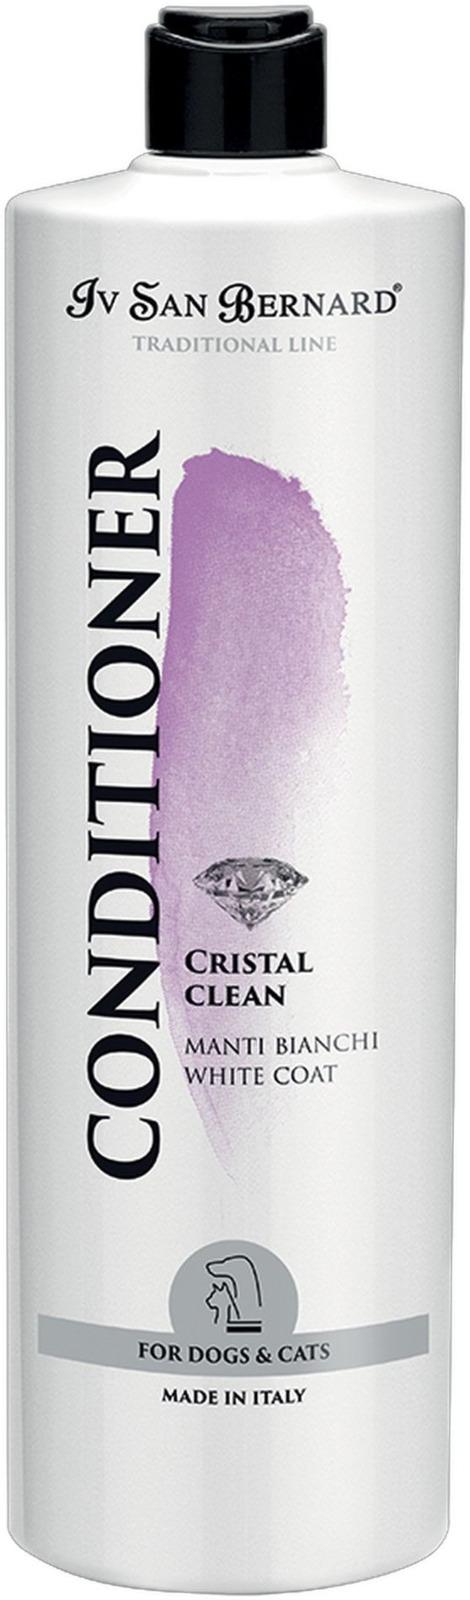 Кондиционер для животных Iv San Bernard ISB Traditional Line Cristal Clean, для устранения желтизны шерсти, 1 л кондиционер для кожи cobra skin clean 0 5 л